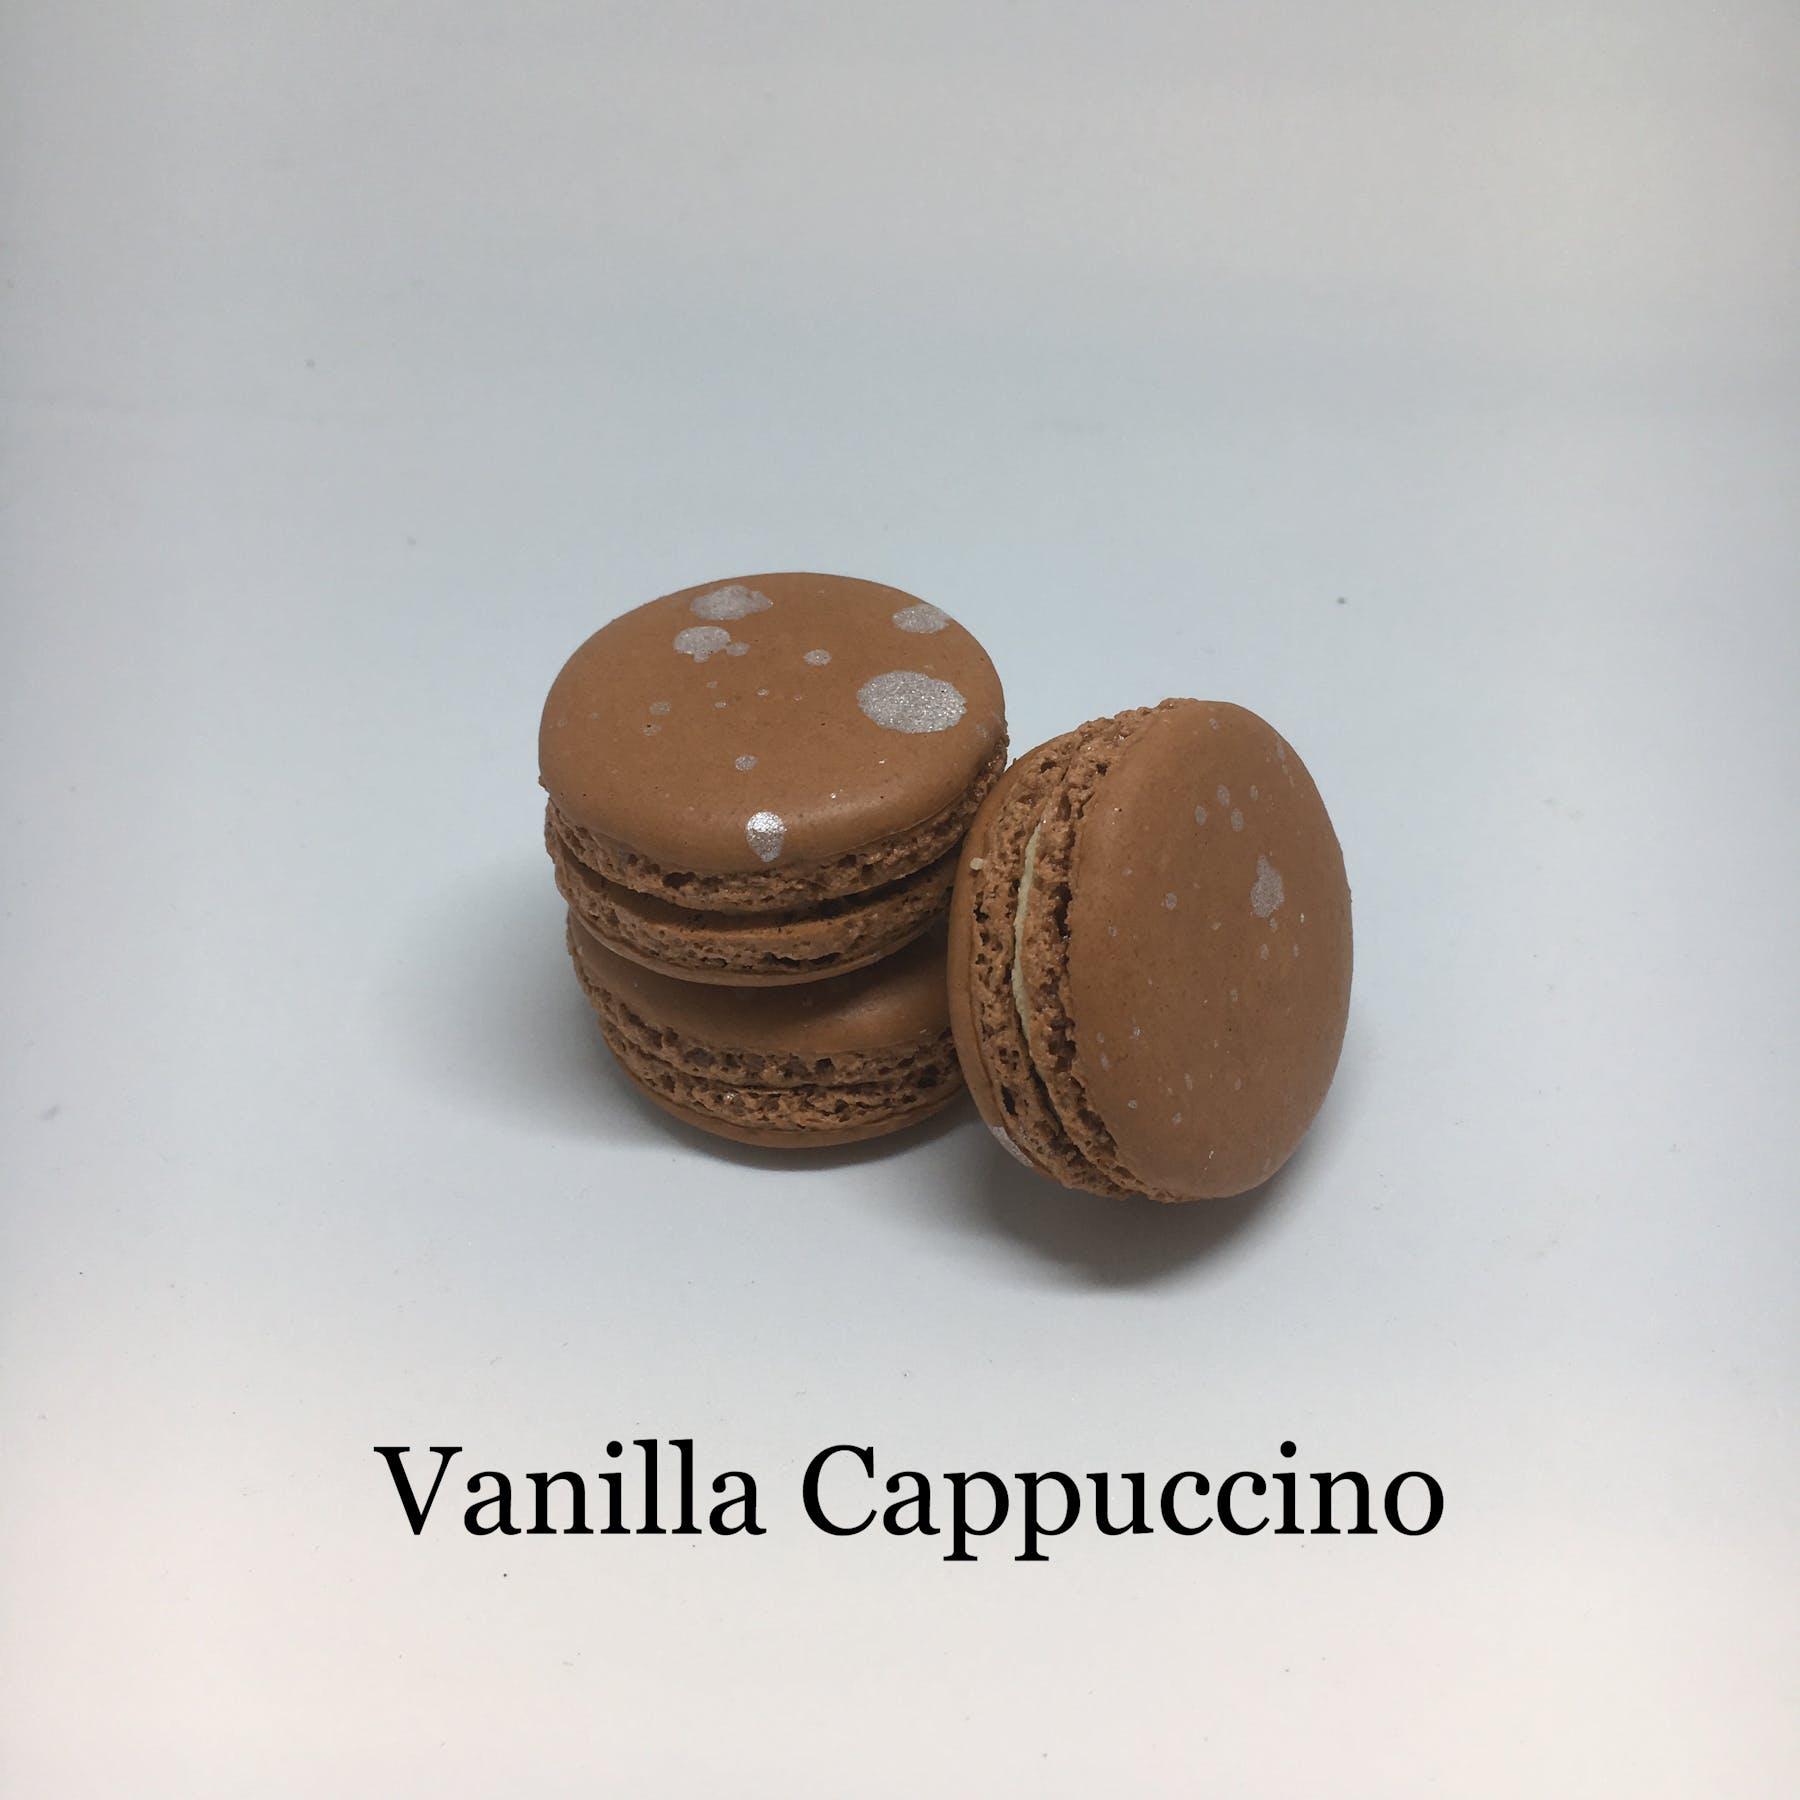 vanilla cappuccino flavored macarons